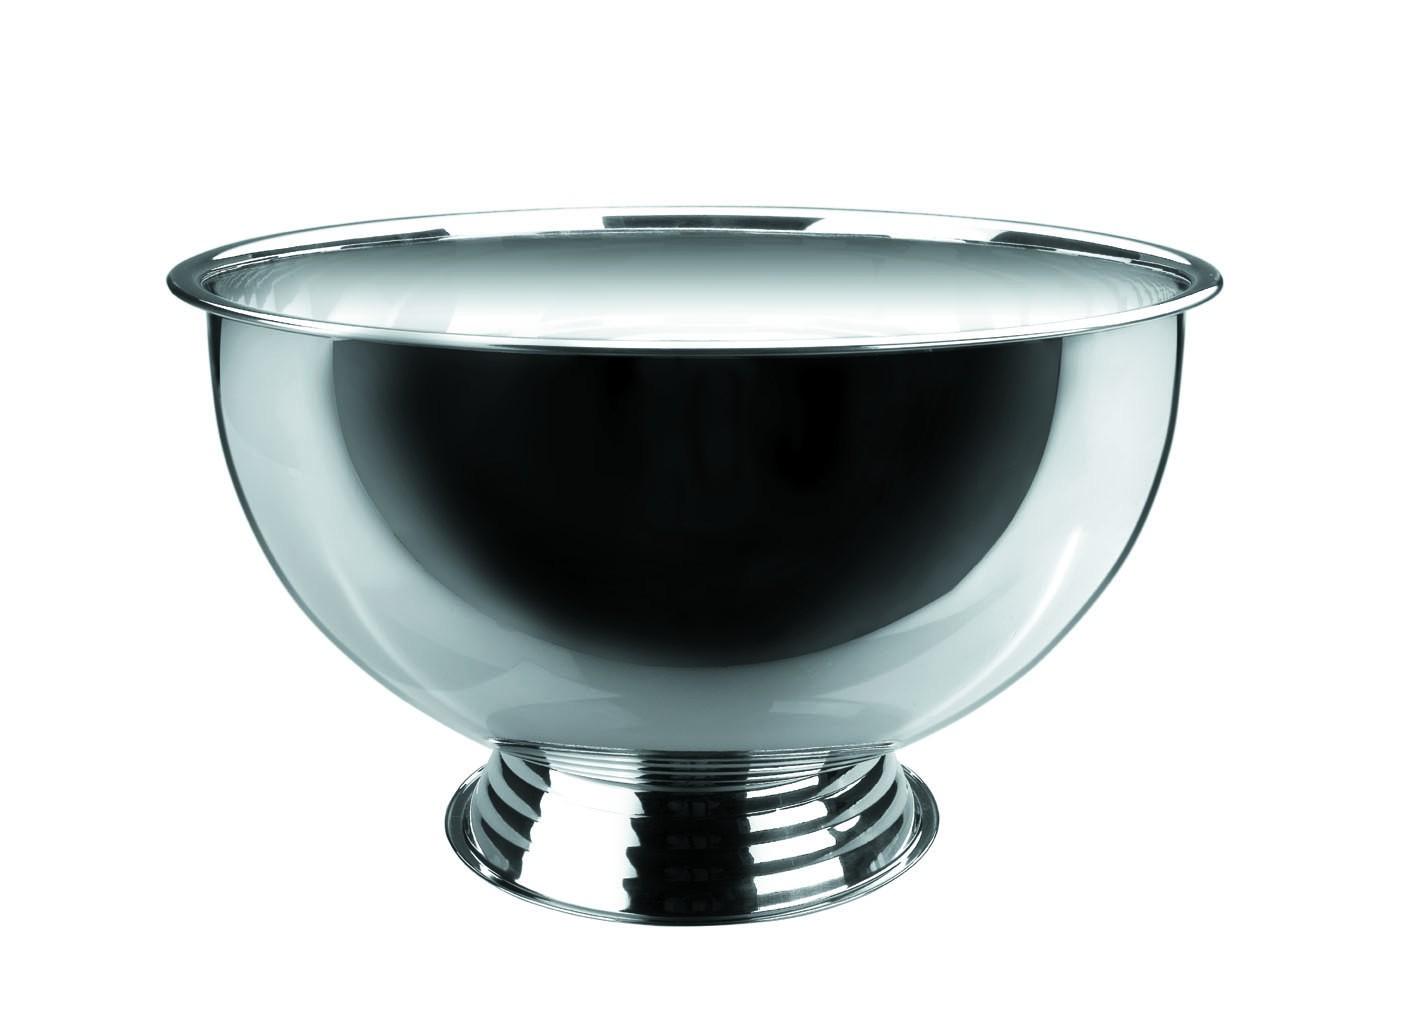 vasque champage inox. Black Bedroom Furniture Sets. Home Design Ideas